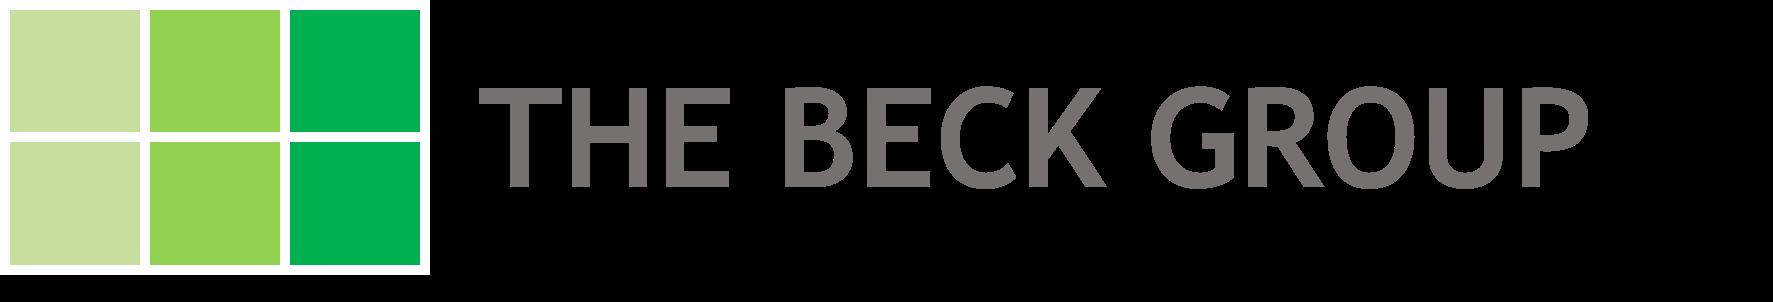 BeckGroupHI.png